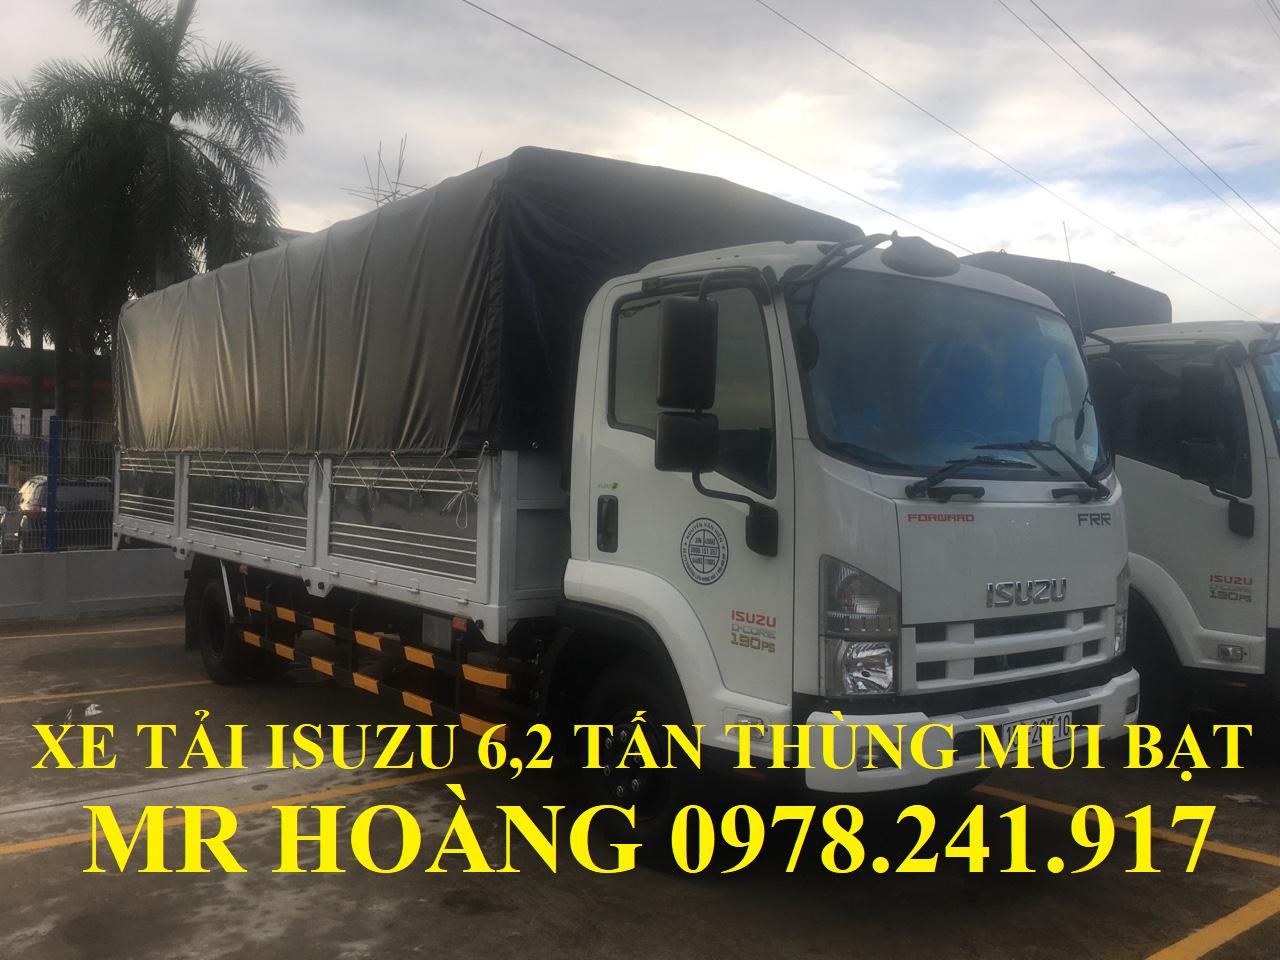 xe tải isuzu 6,2 tấn thùng mui bạt